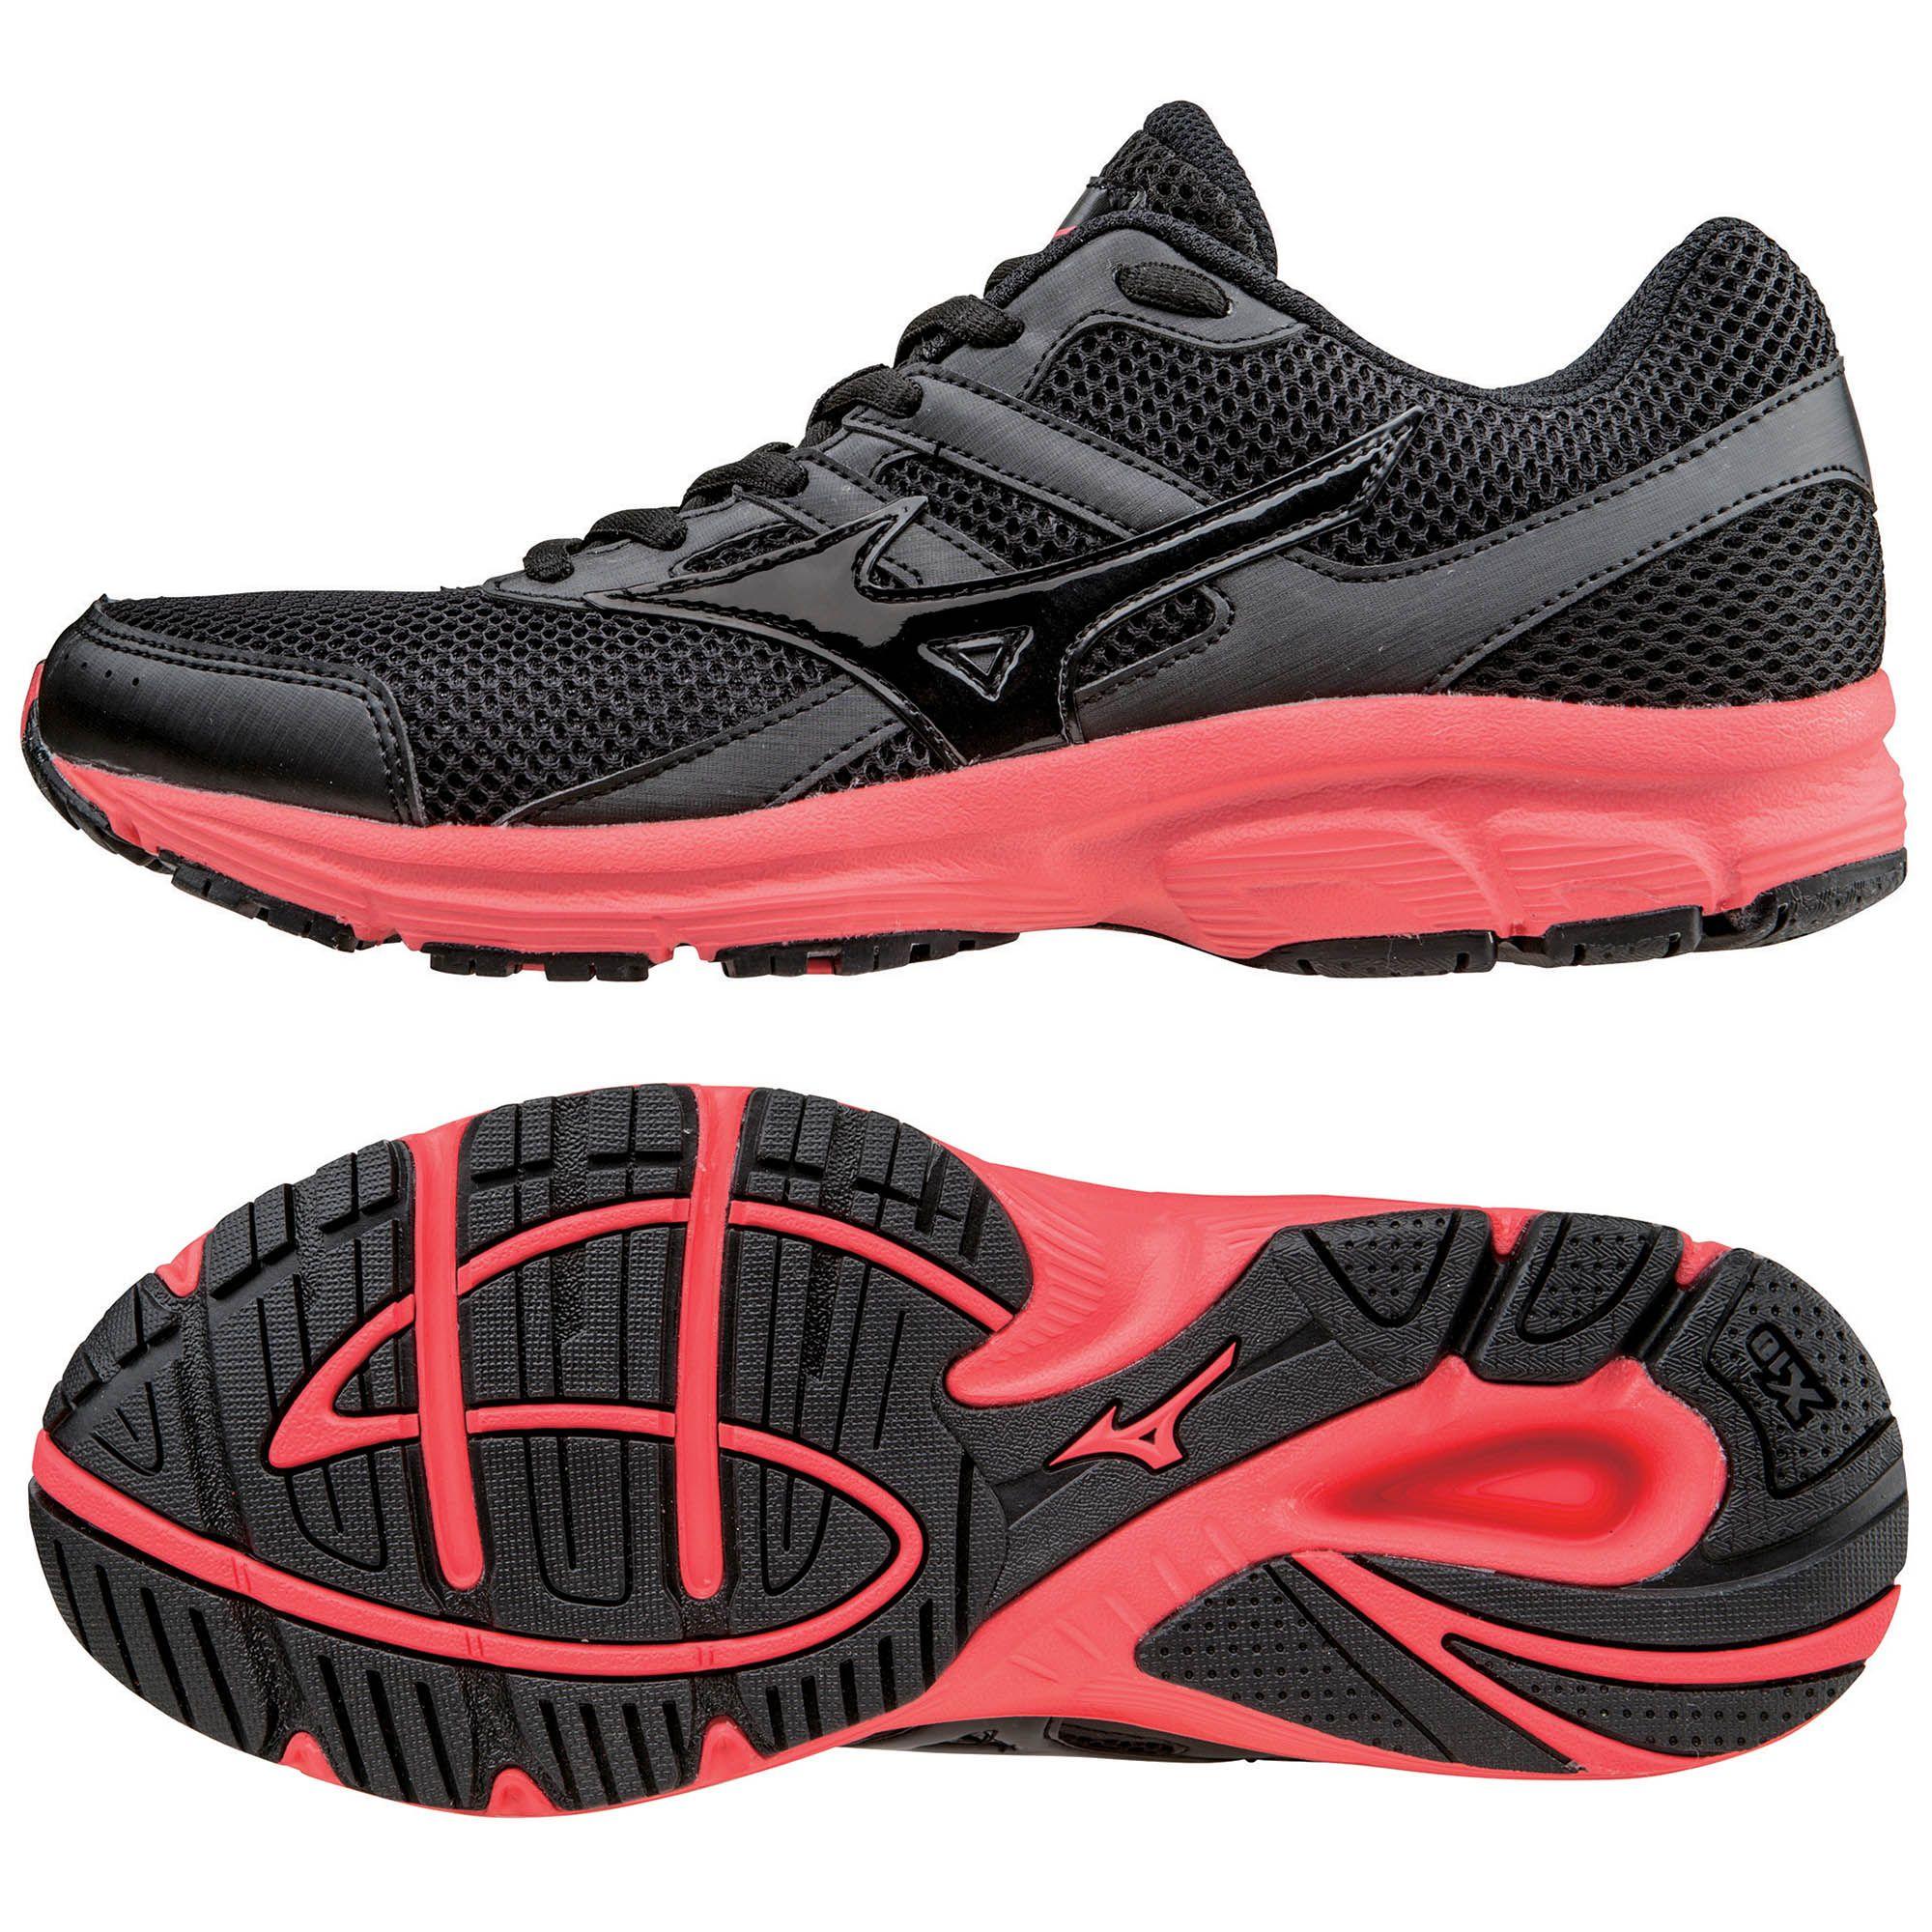 Mizuno Ladies Running Shoes Review